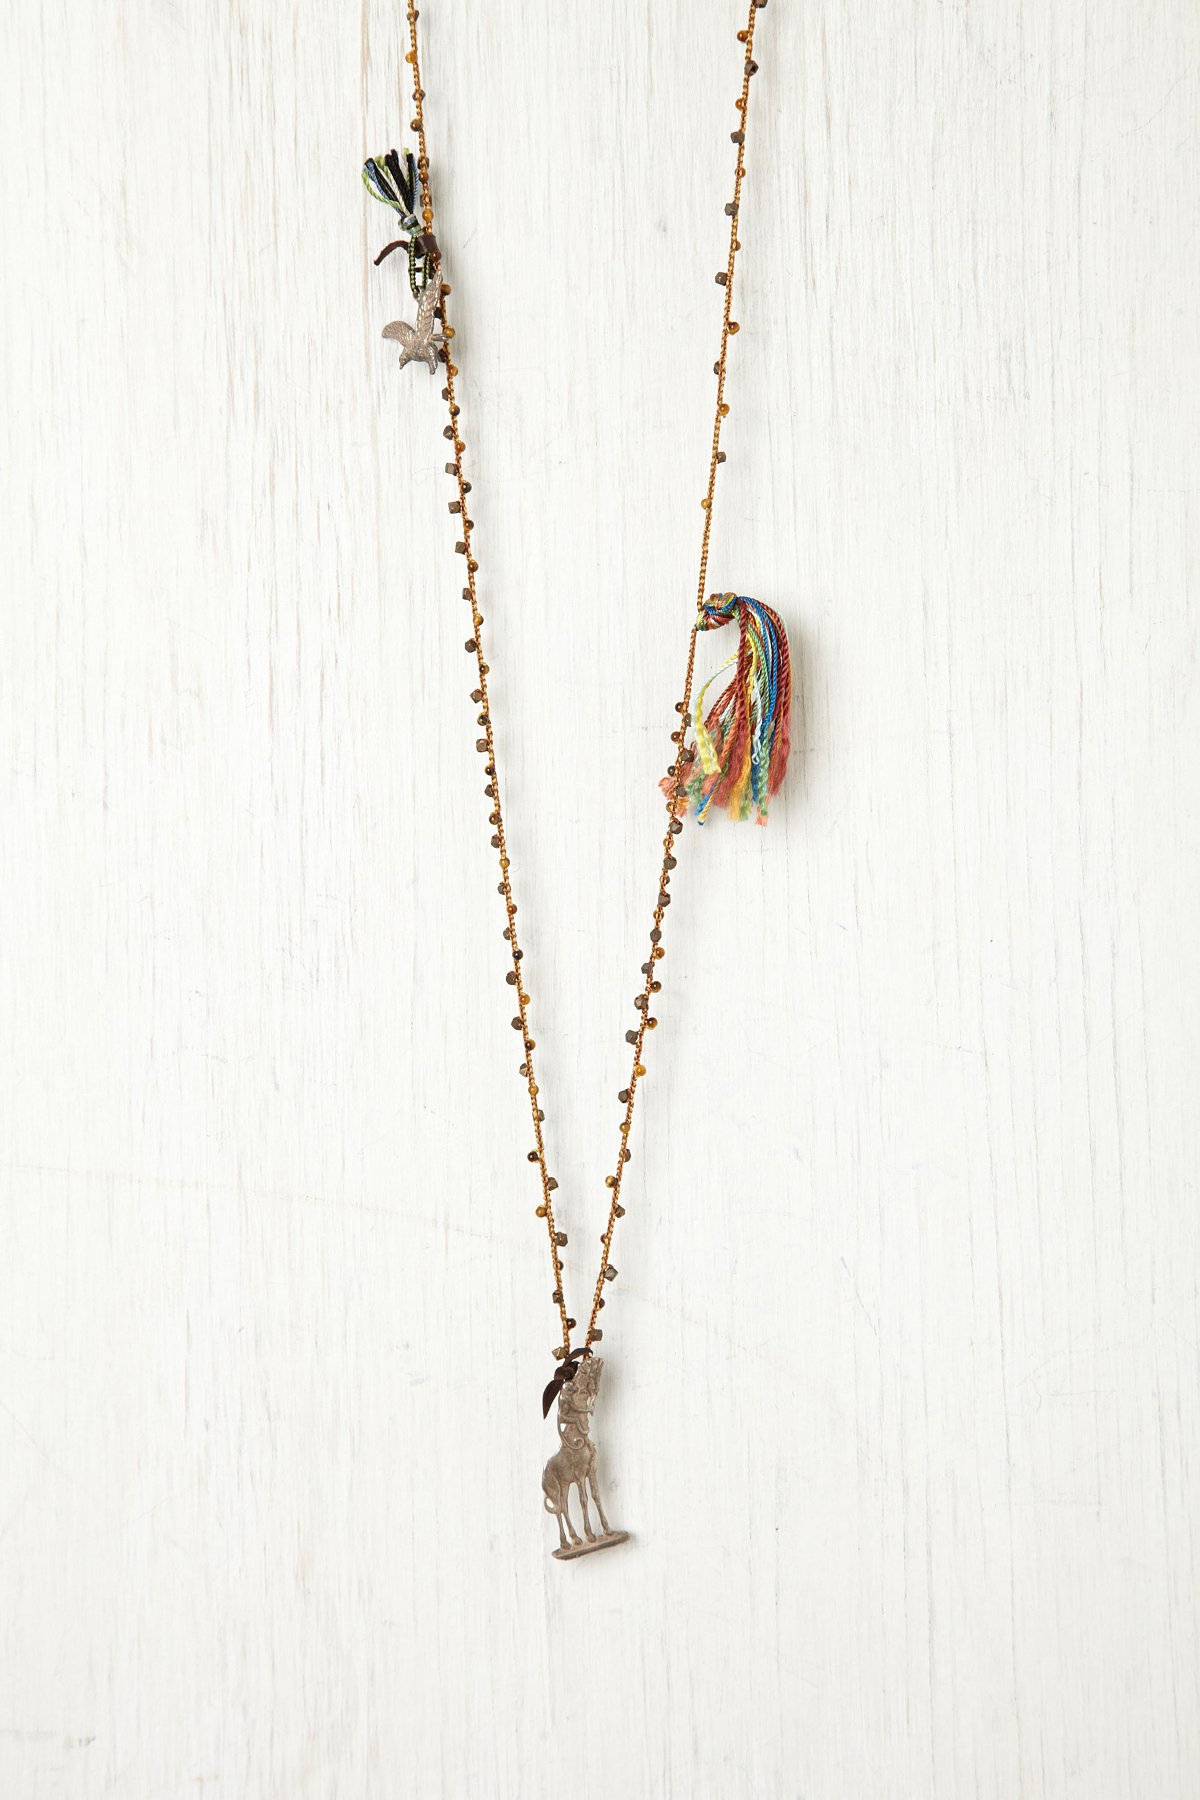 Tassel and Giraffe Rosary